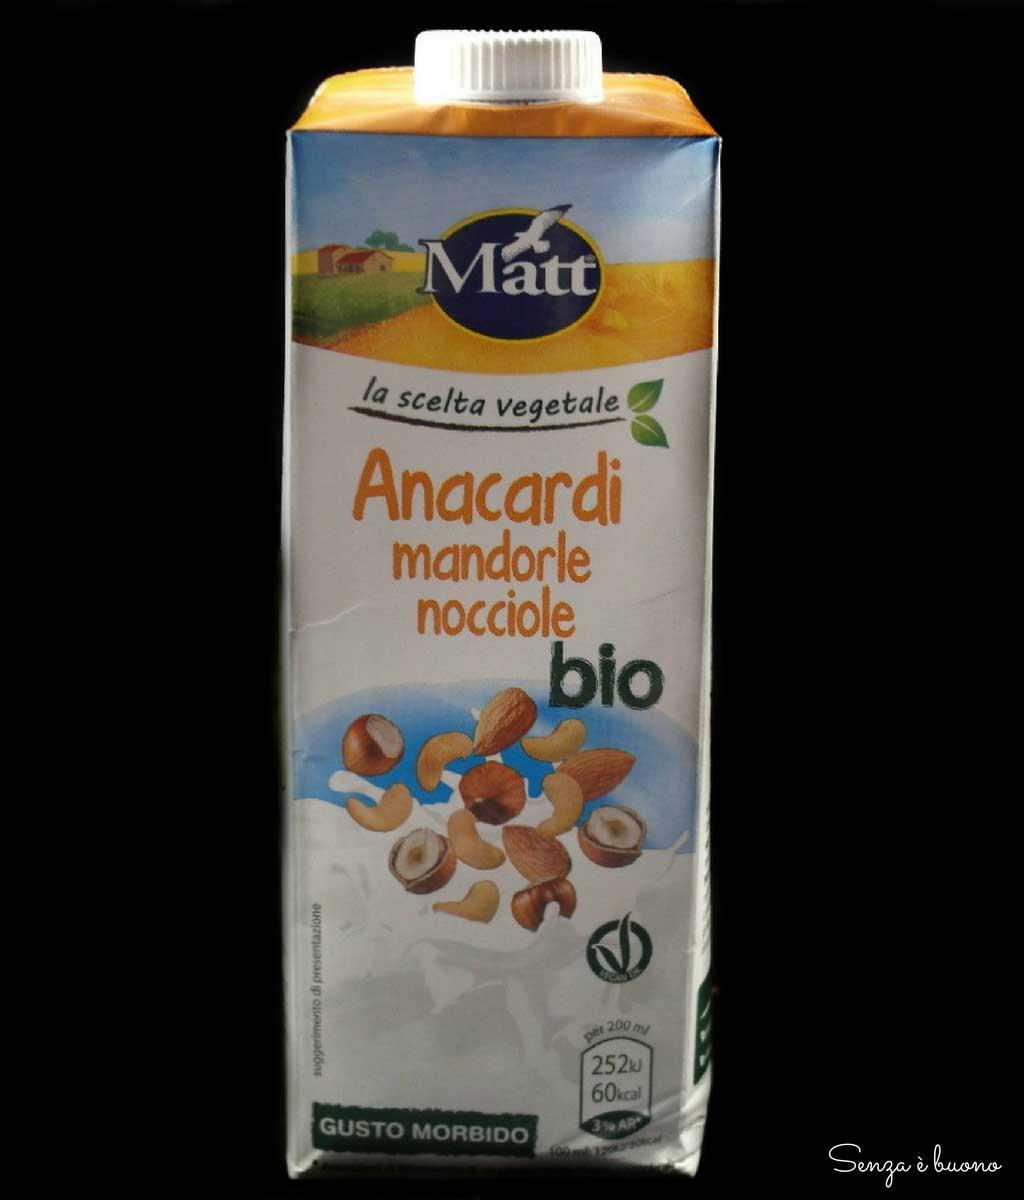 Latte vegetale Matt Benessere